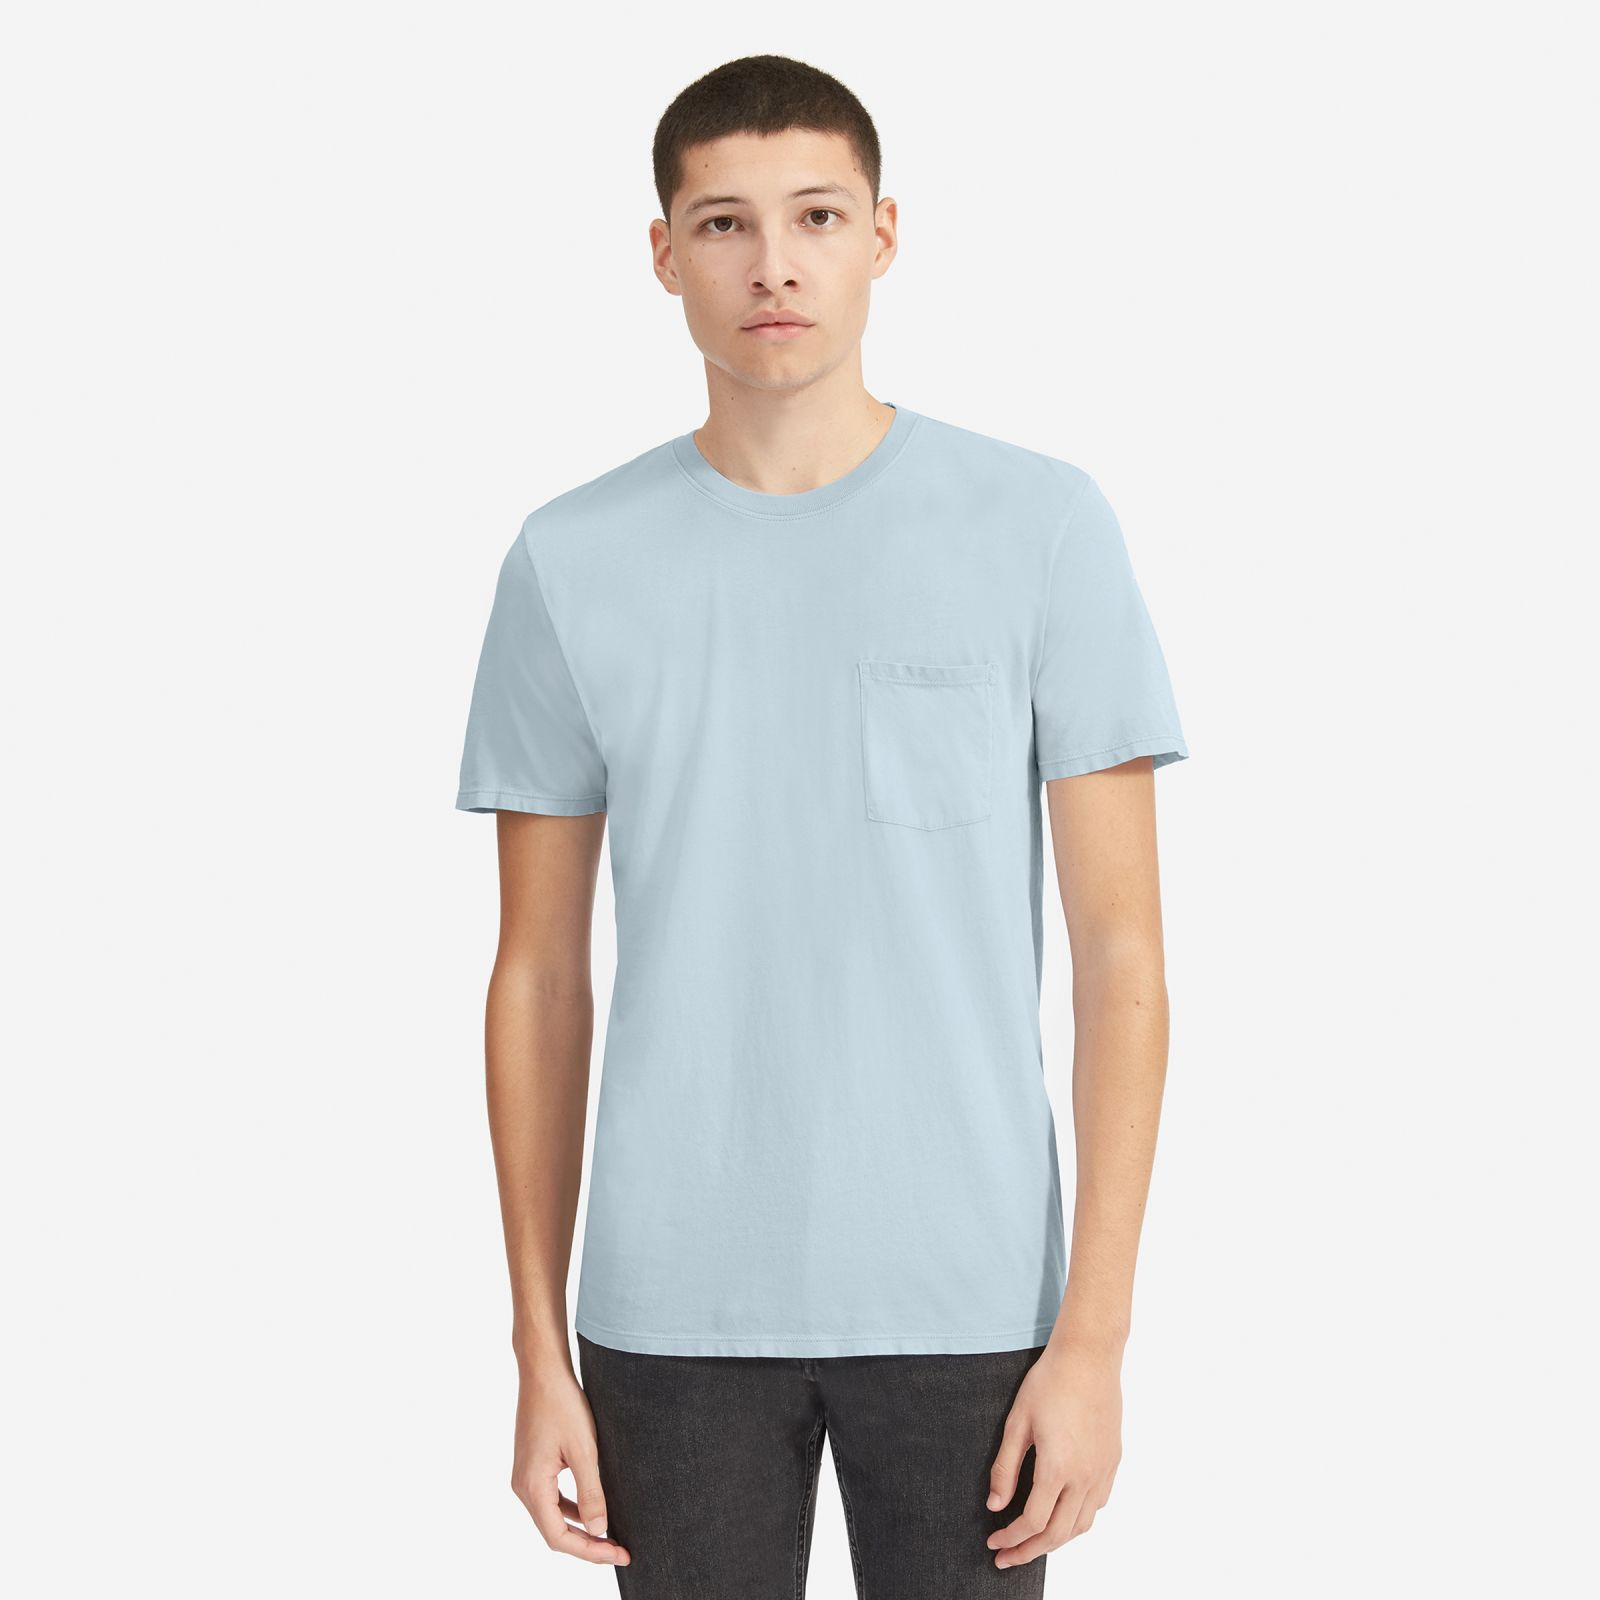 men's cotton pocket t-shirt | uniform by everlane in light blue, size xl